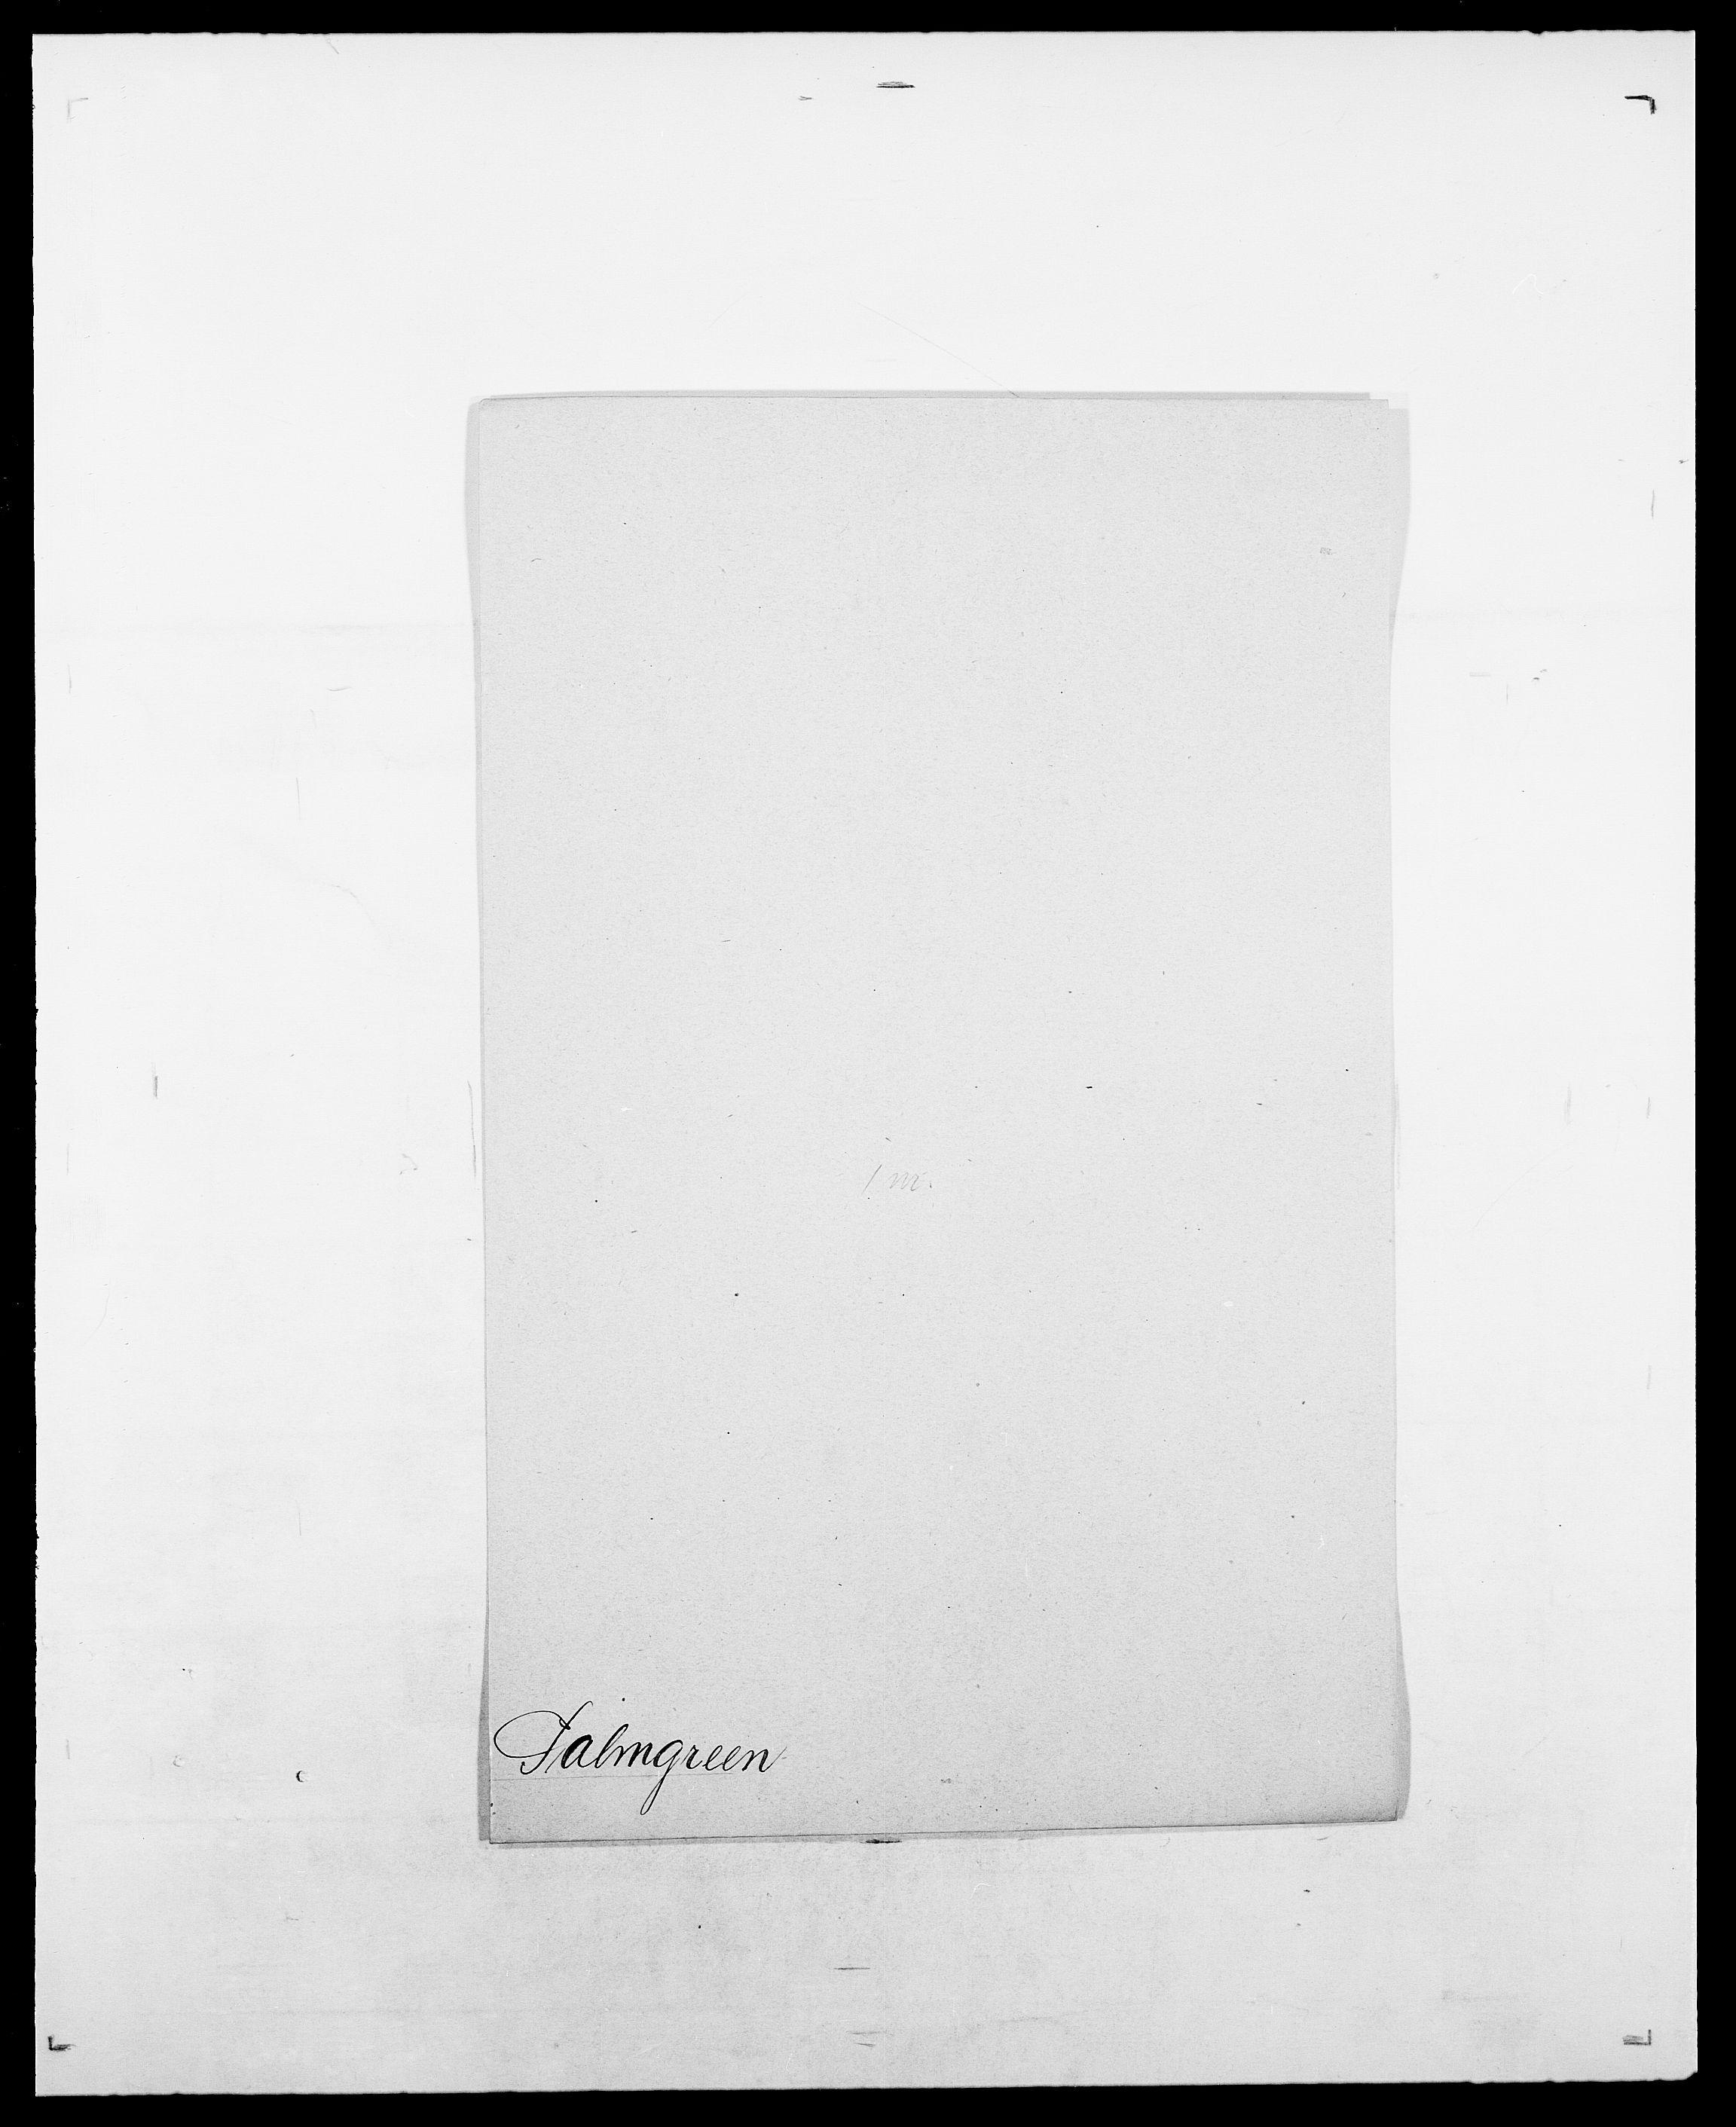 SAO, Delgobe, Charles Antoine - samling, D/Da/L0030: Paars - Pittelkov, s. 68